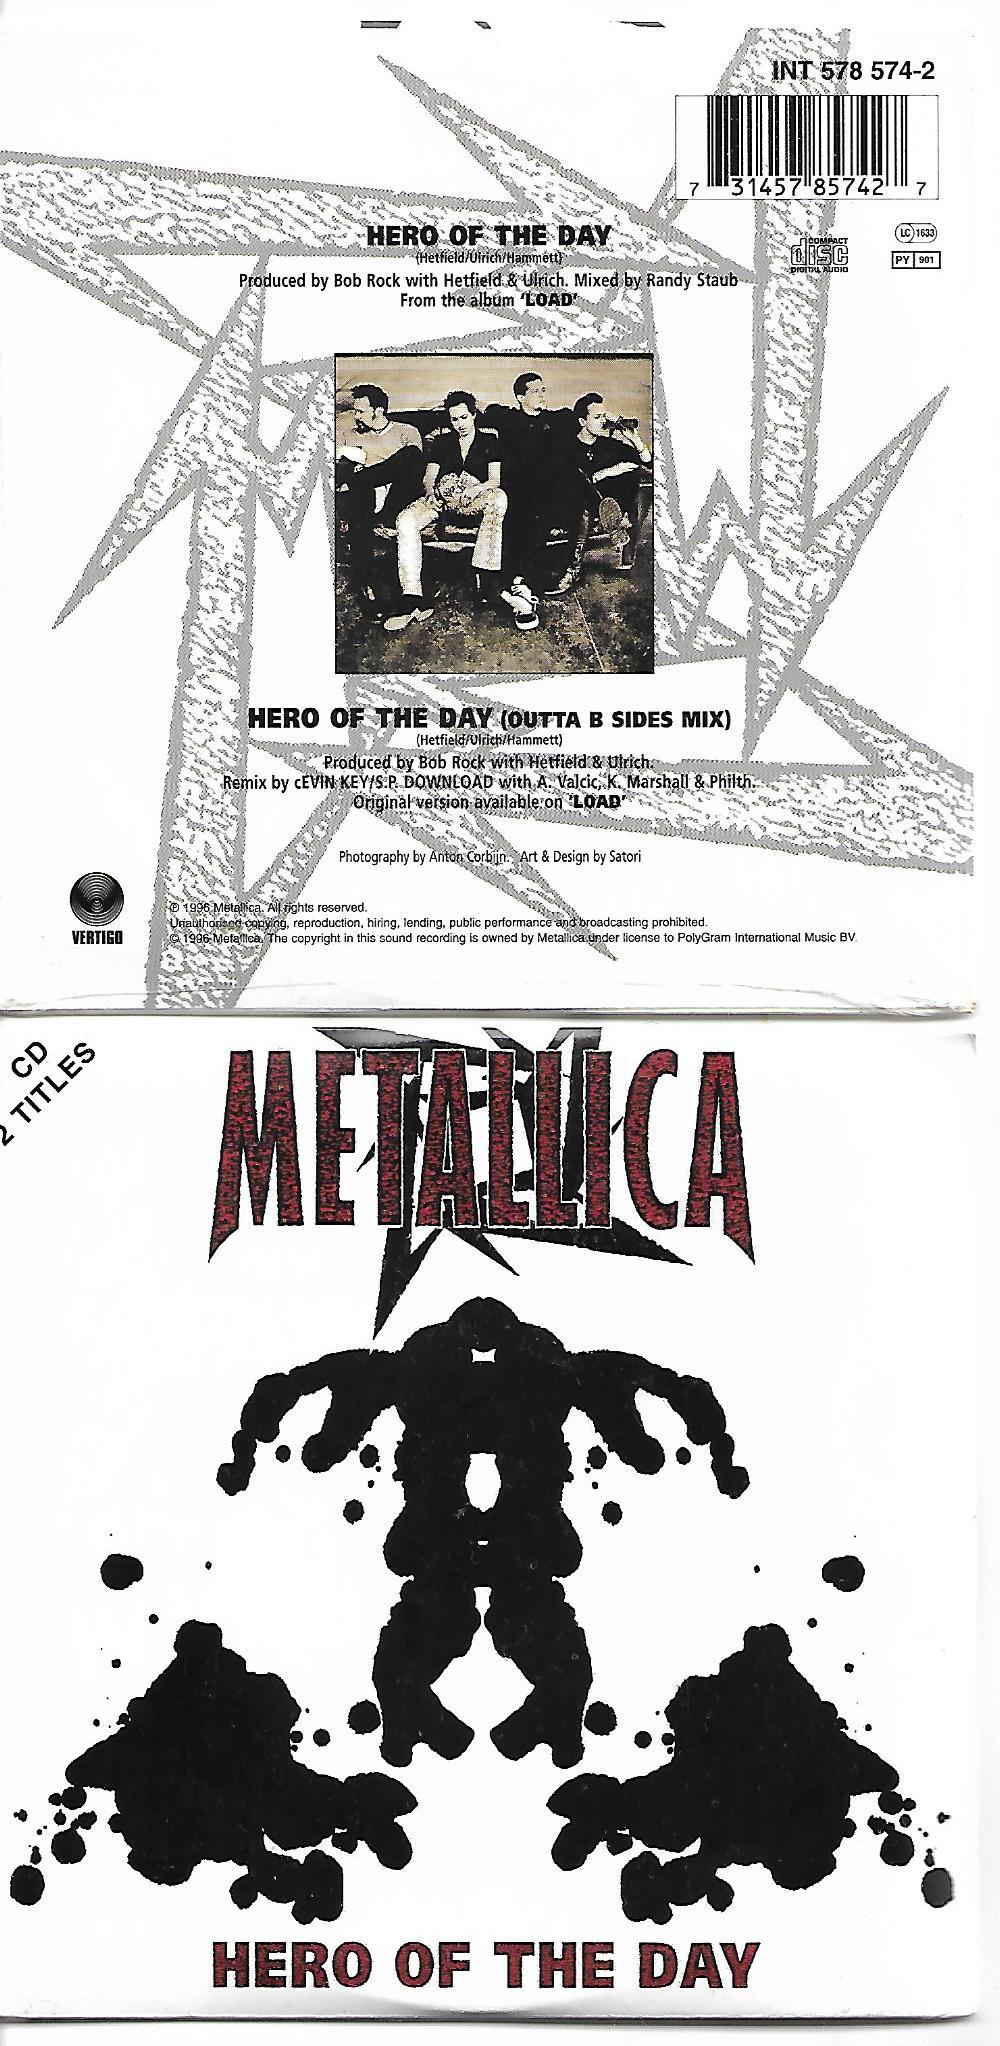 metallica001.jpg